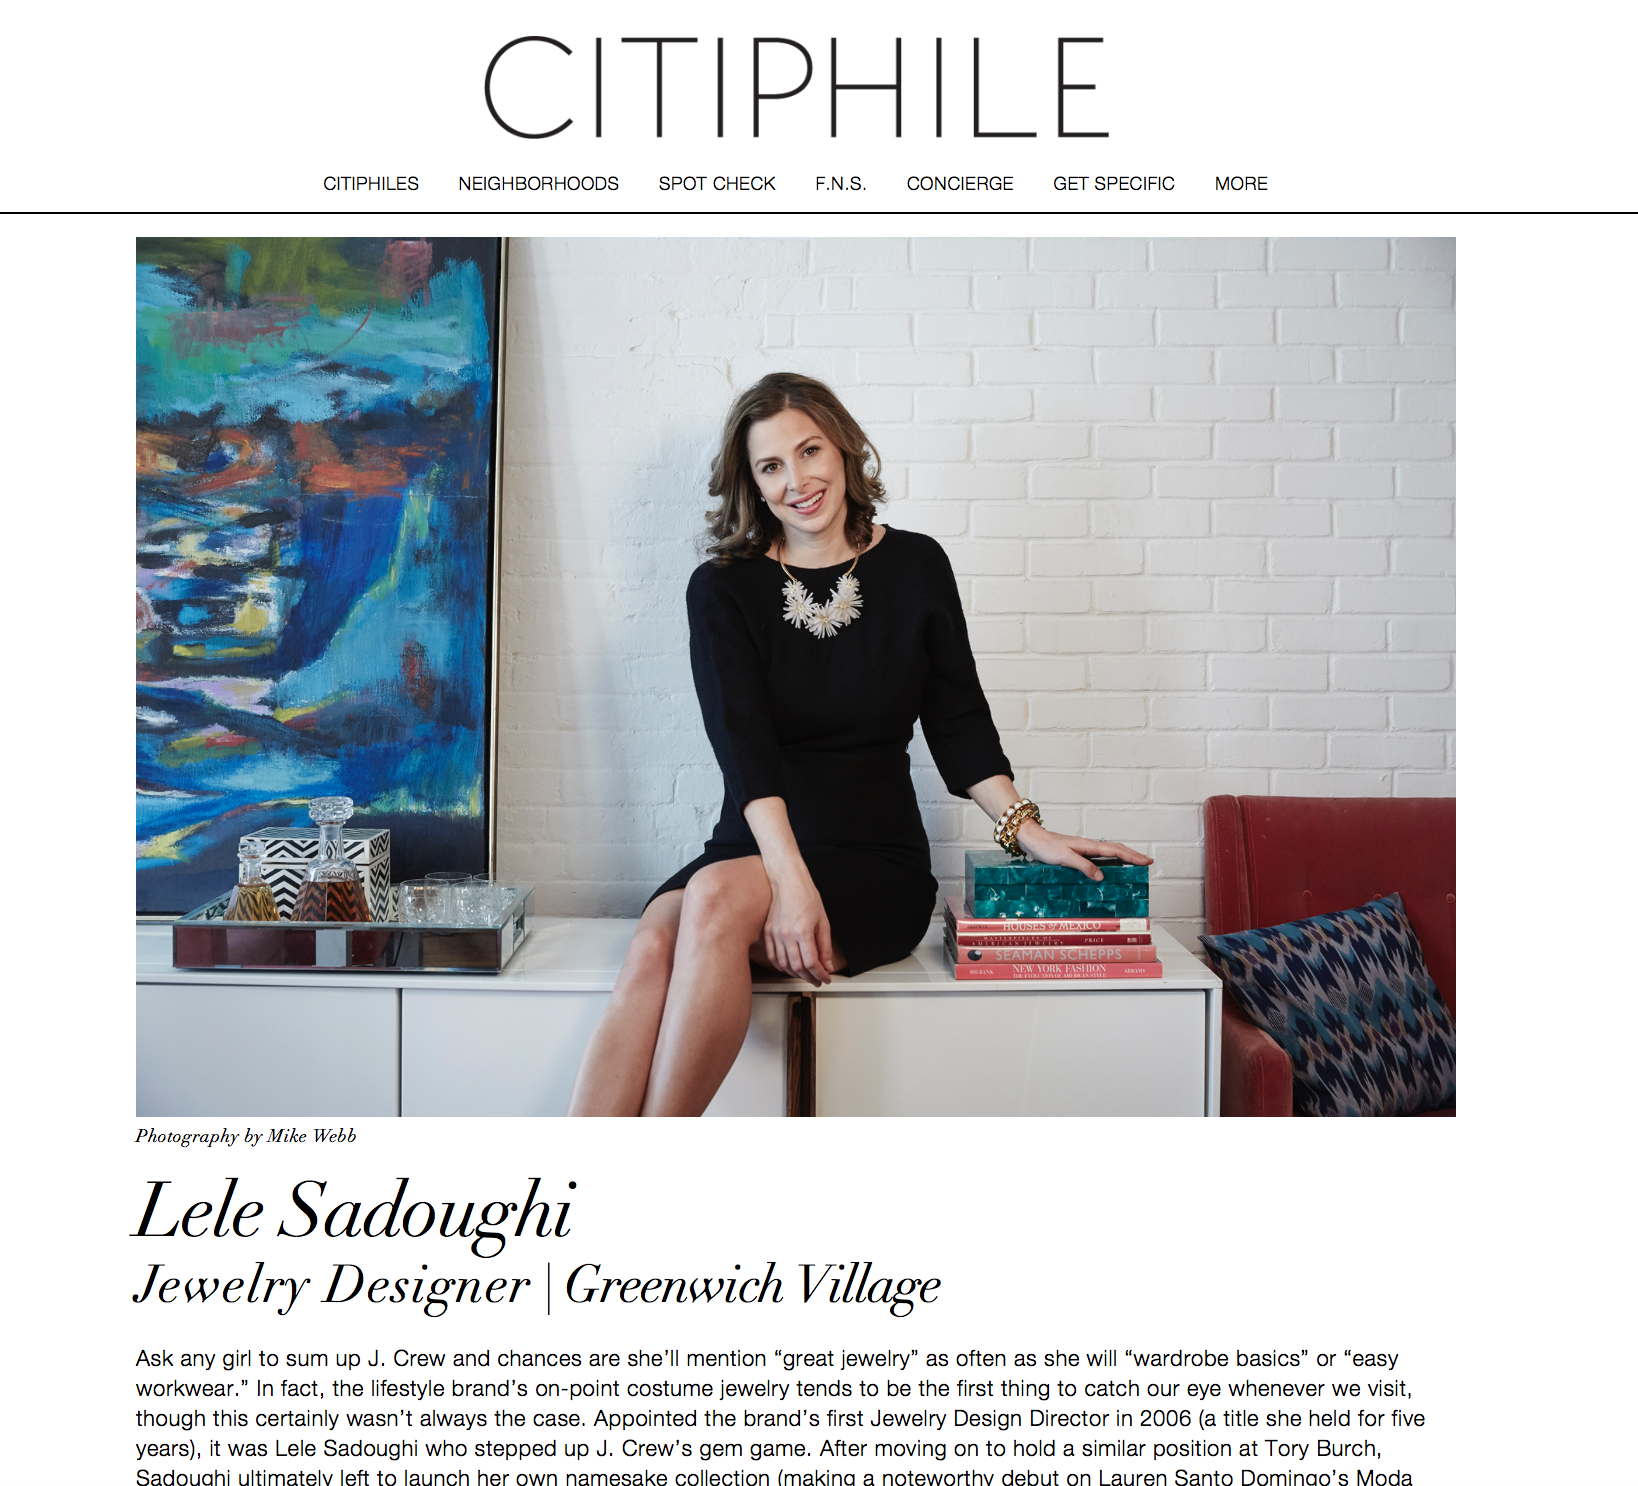 Press: The Citiphile   Featuring: Lele Sadoughi